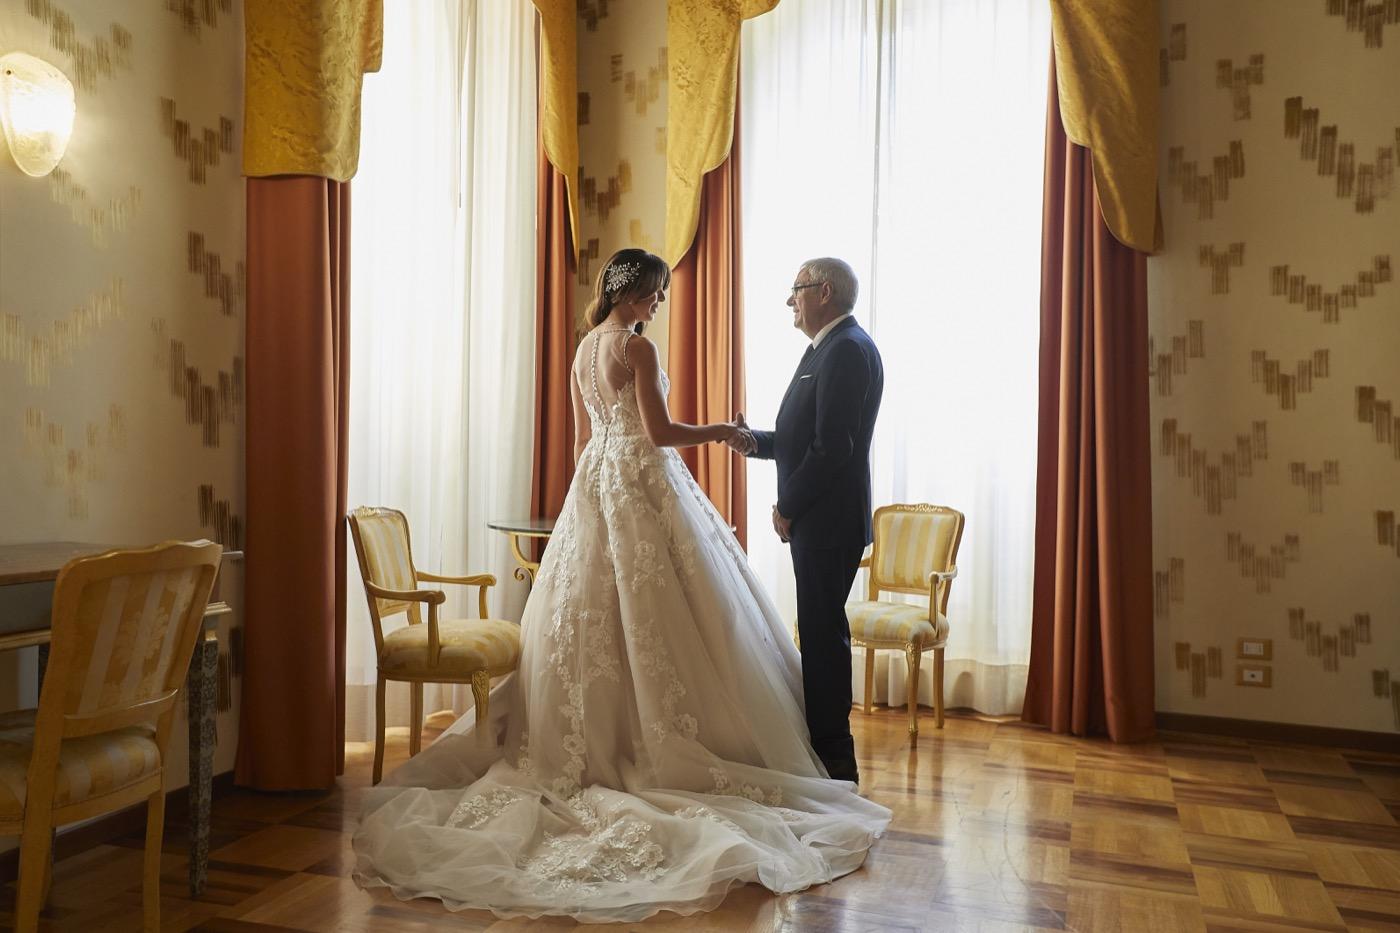 Claudio-Coppola-wedding-photographer-la-scuderia-eventi-preparativi-la-rosetta-perugia-25